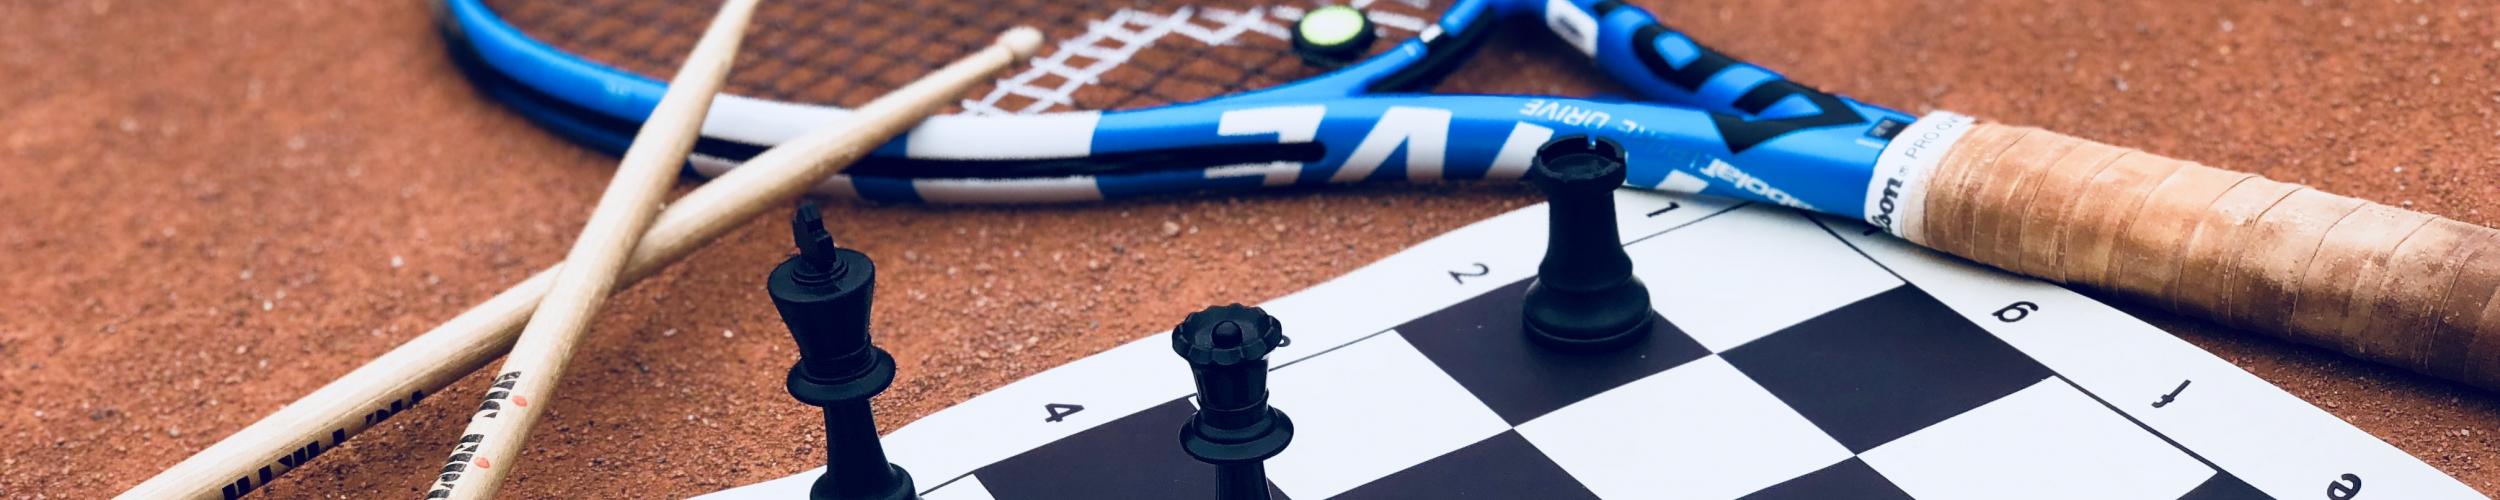 Multistage: Tennis, Schaken en Drummen